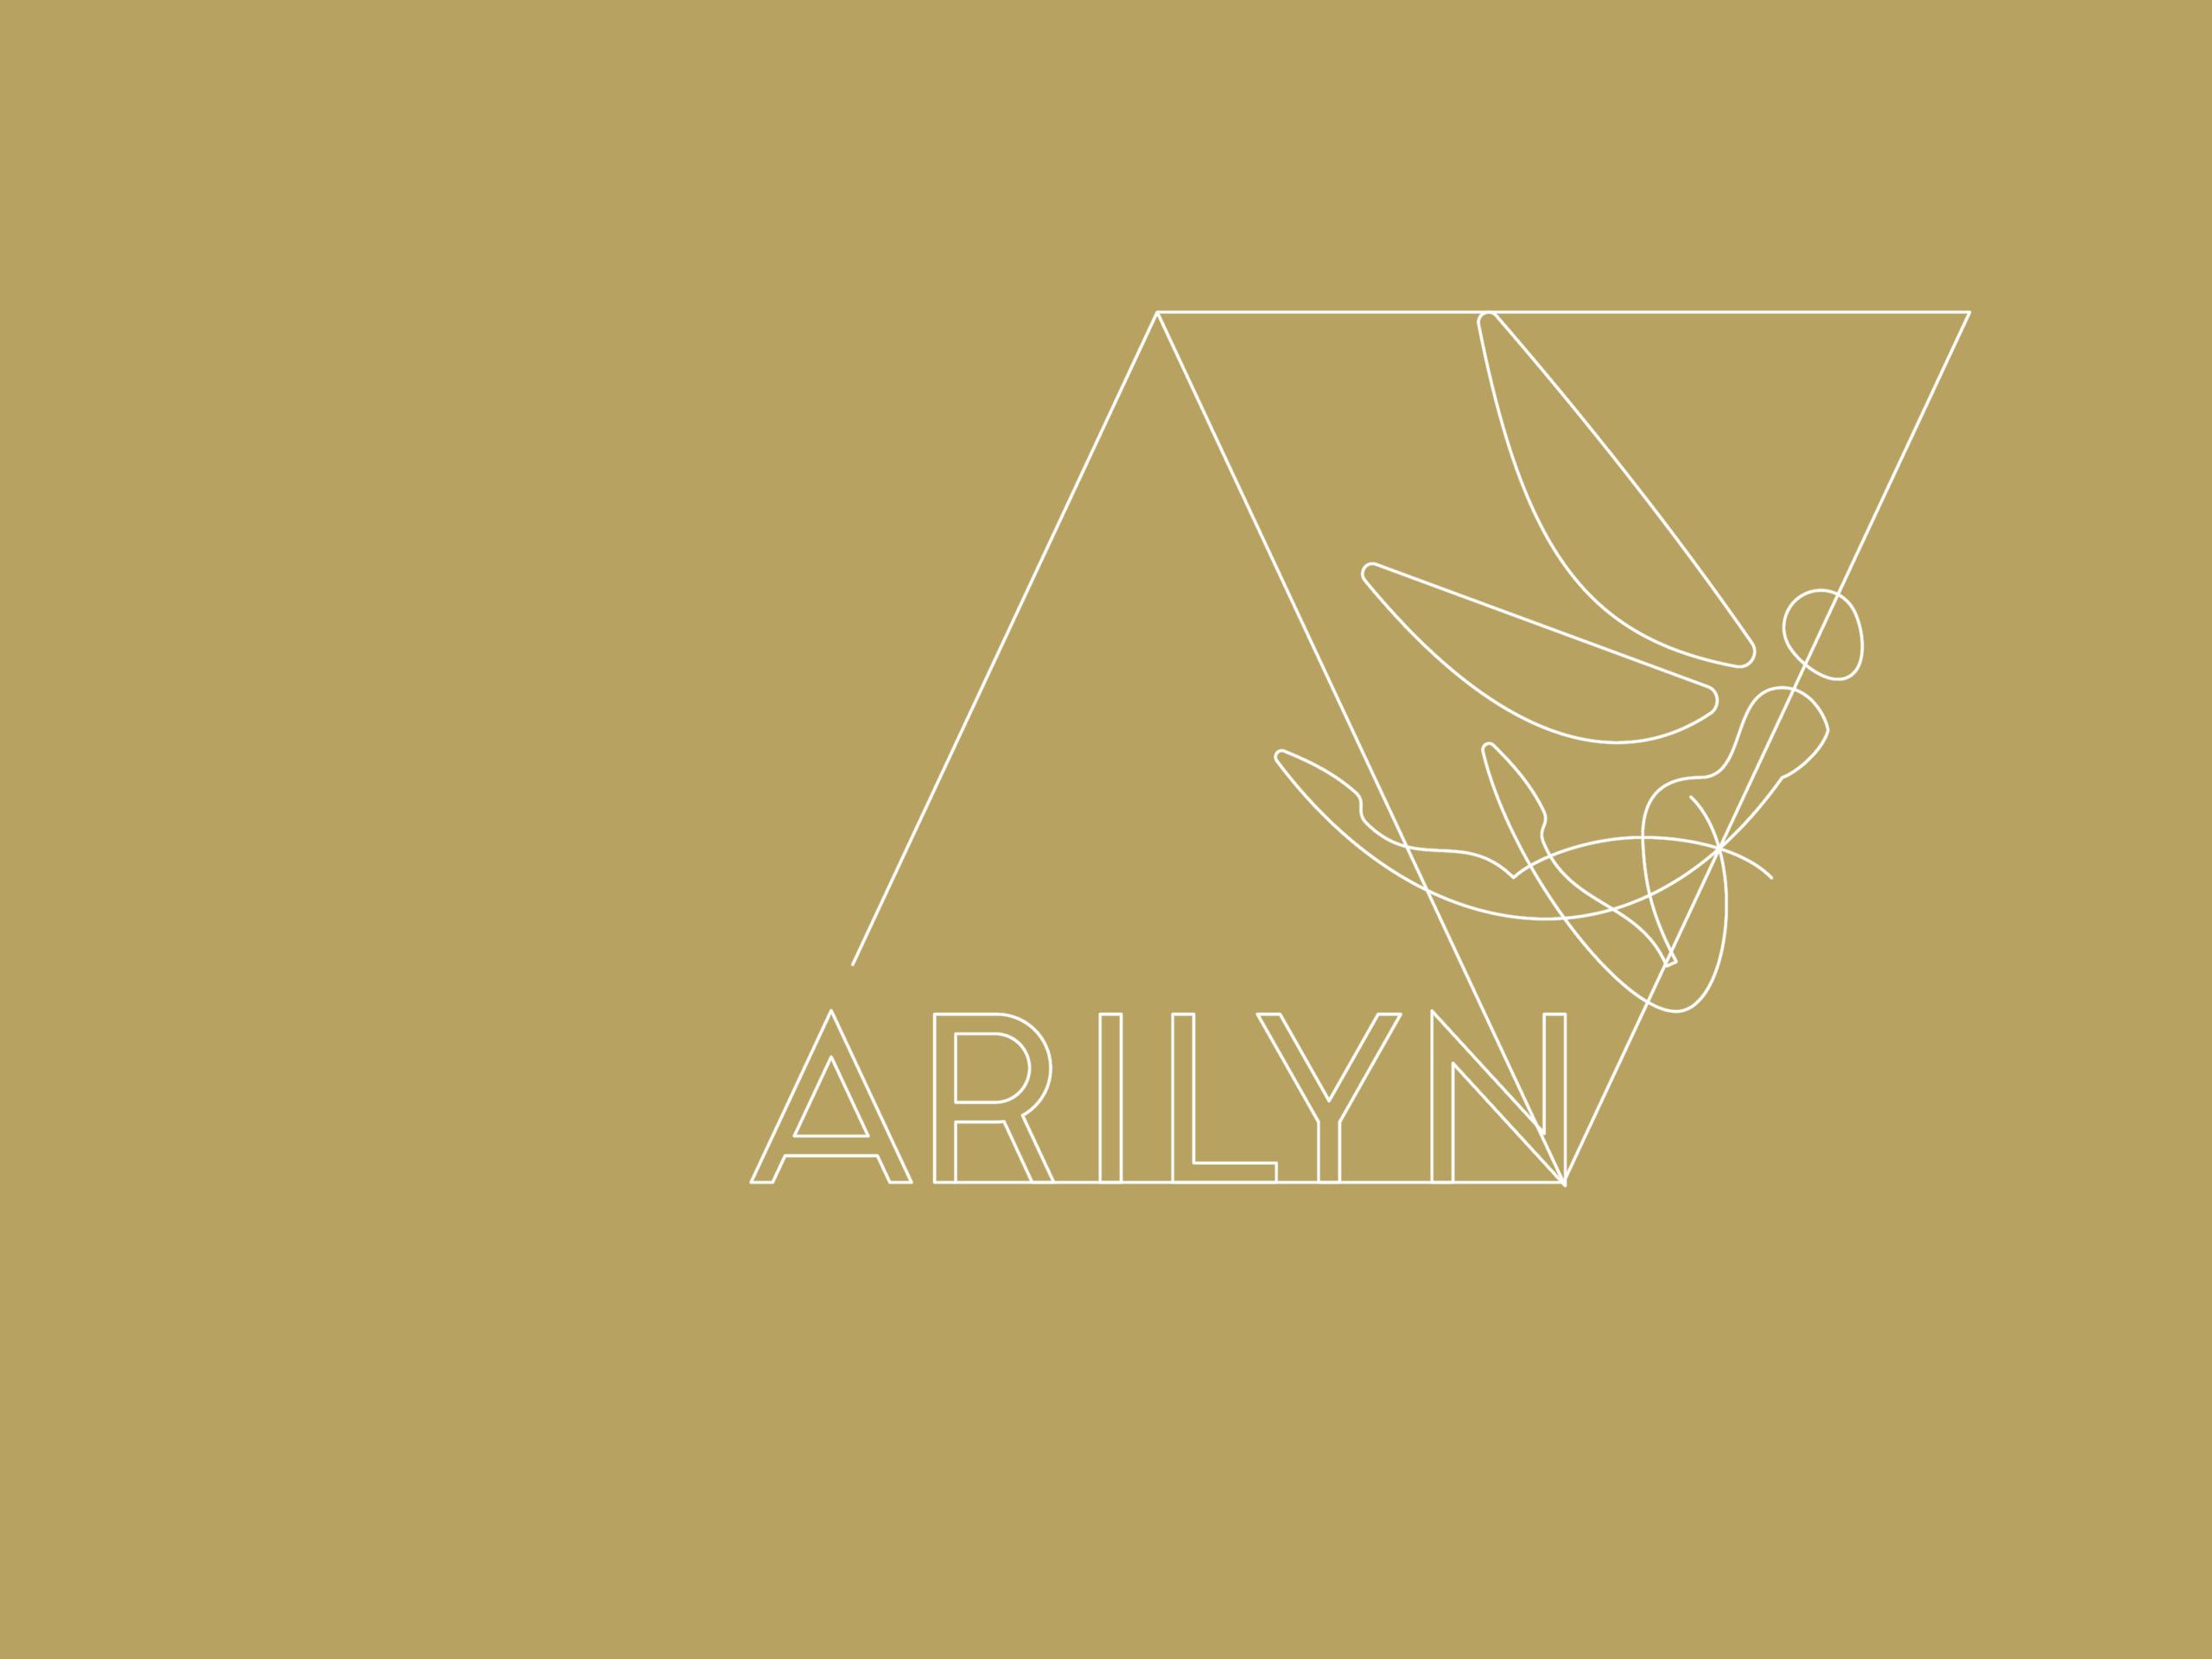 arilyn-tunnus3-goldprint-2019-11-22